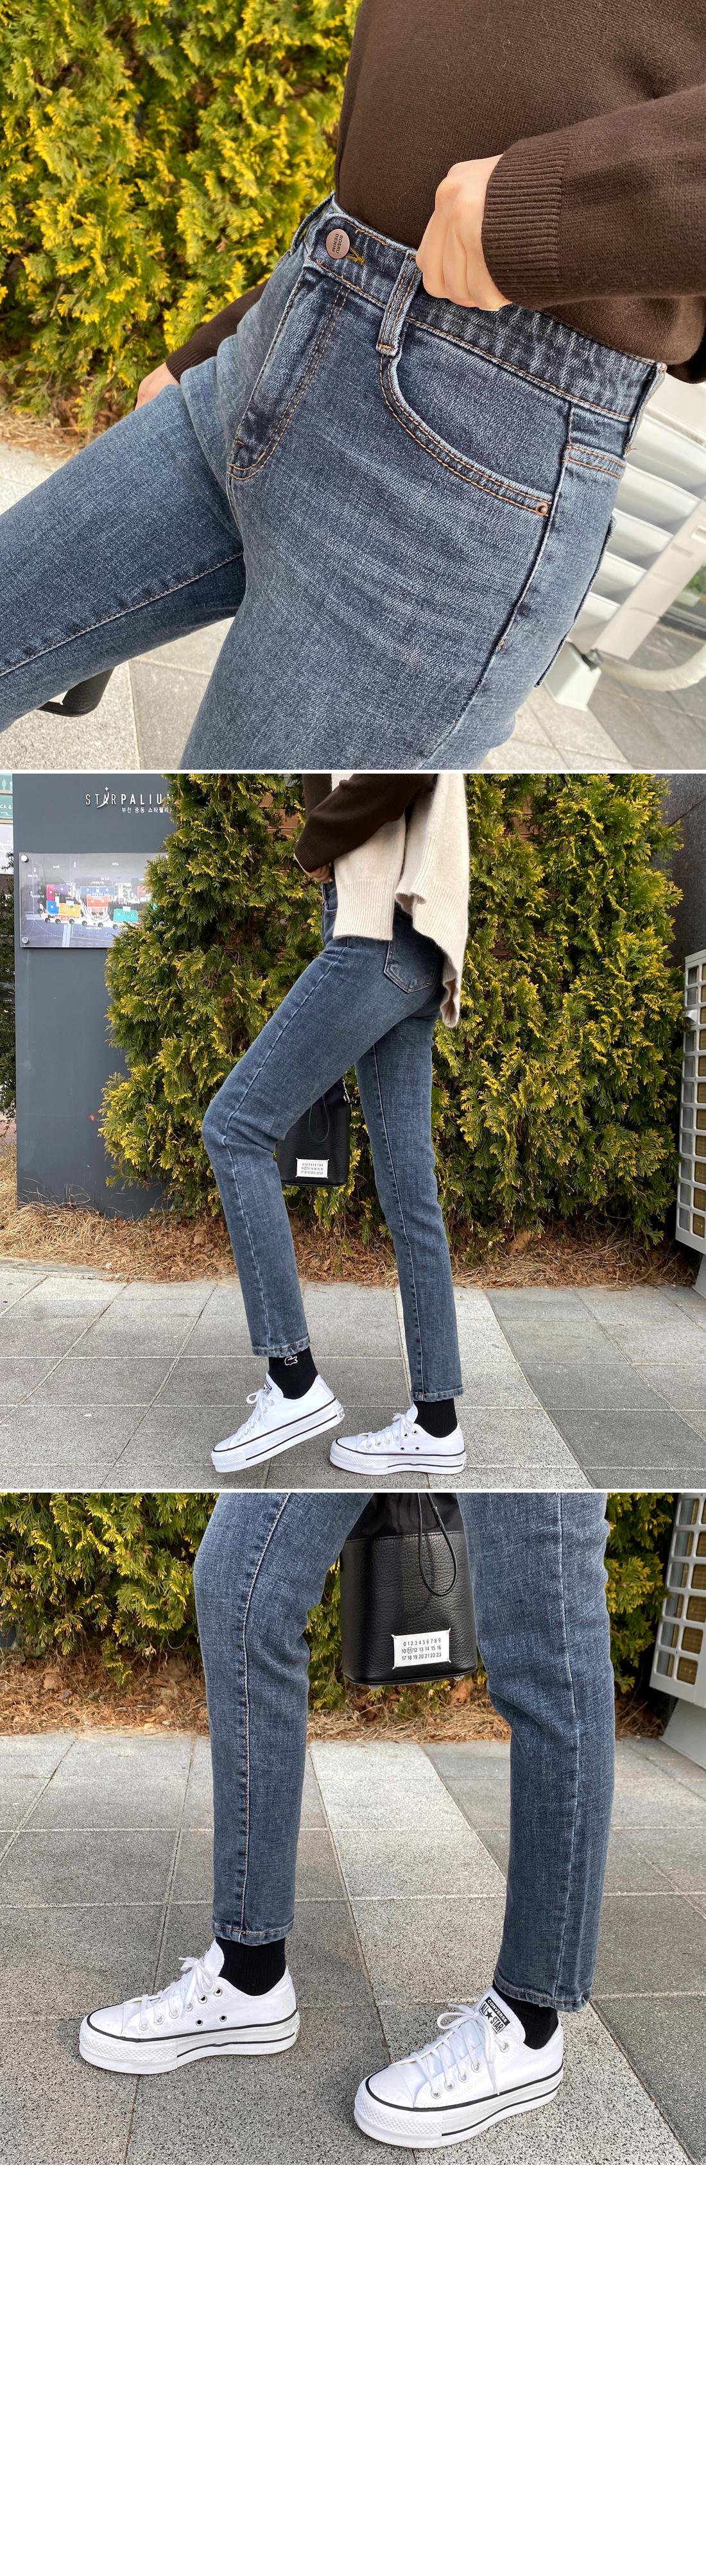 Vintage Fleece-lined slim date jeans